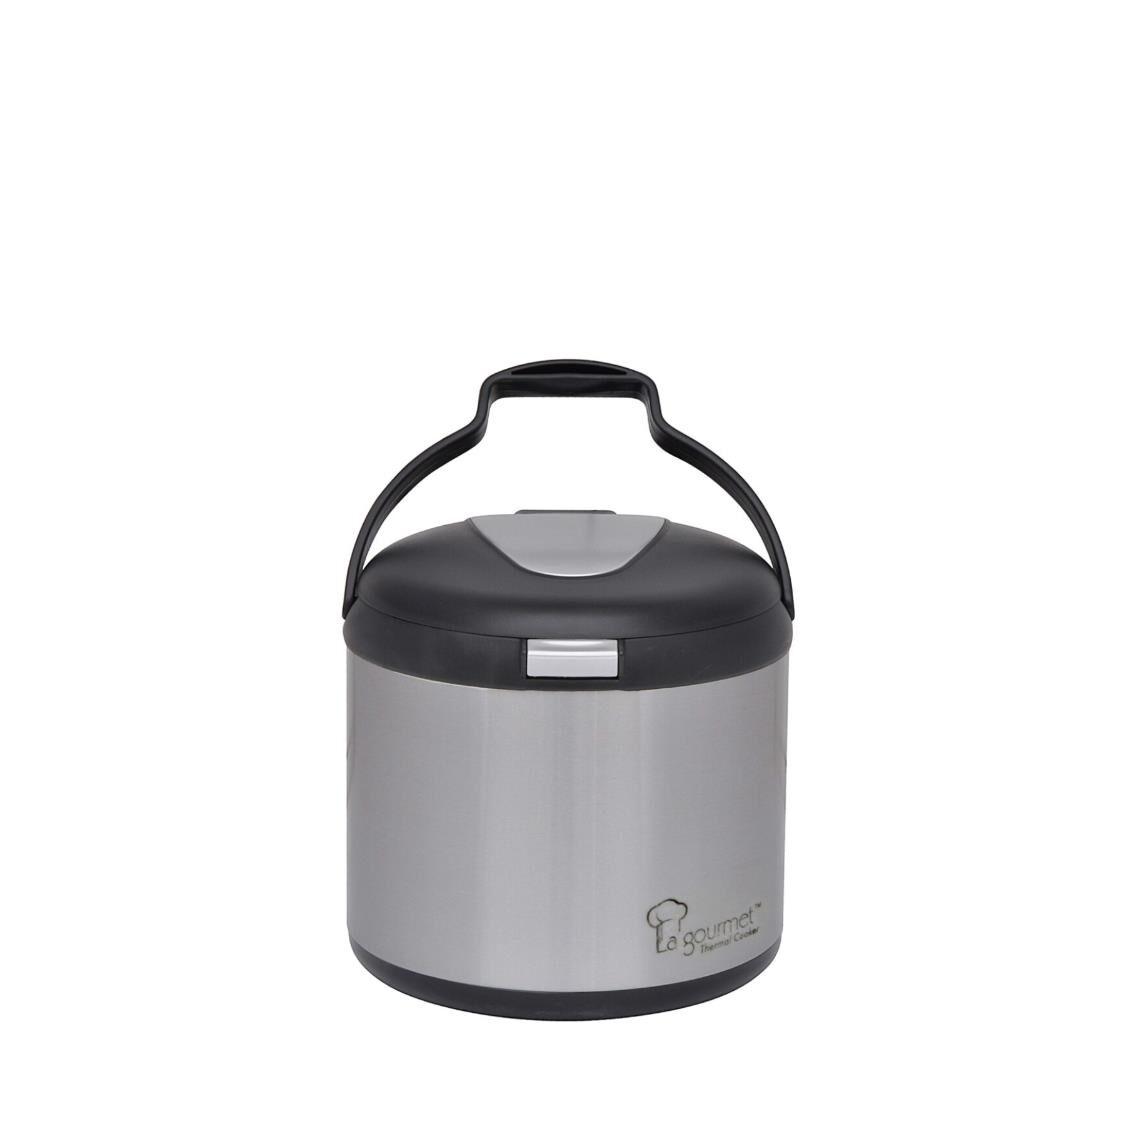 La Gourmet 7L Thermal Cooker  FOC 15L Thermal Cooker LGWC207869207876